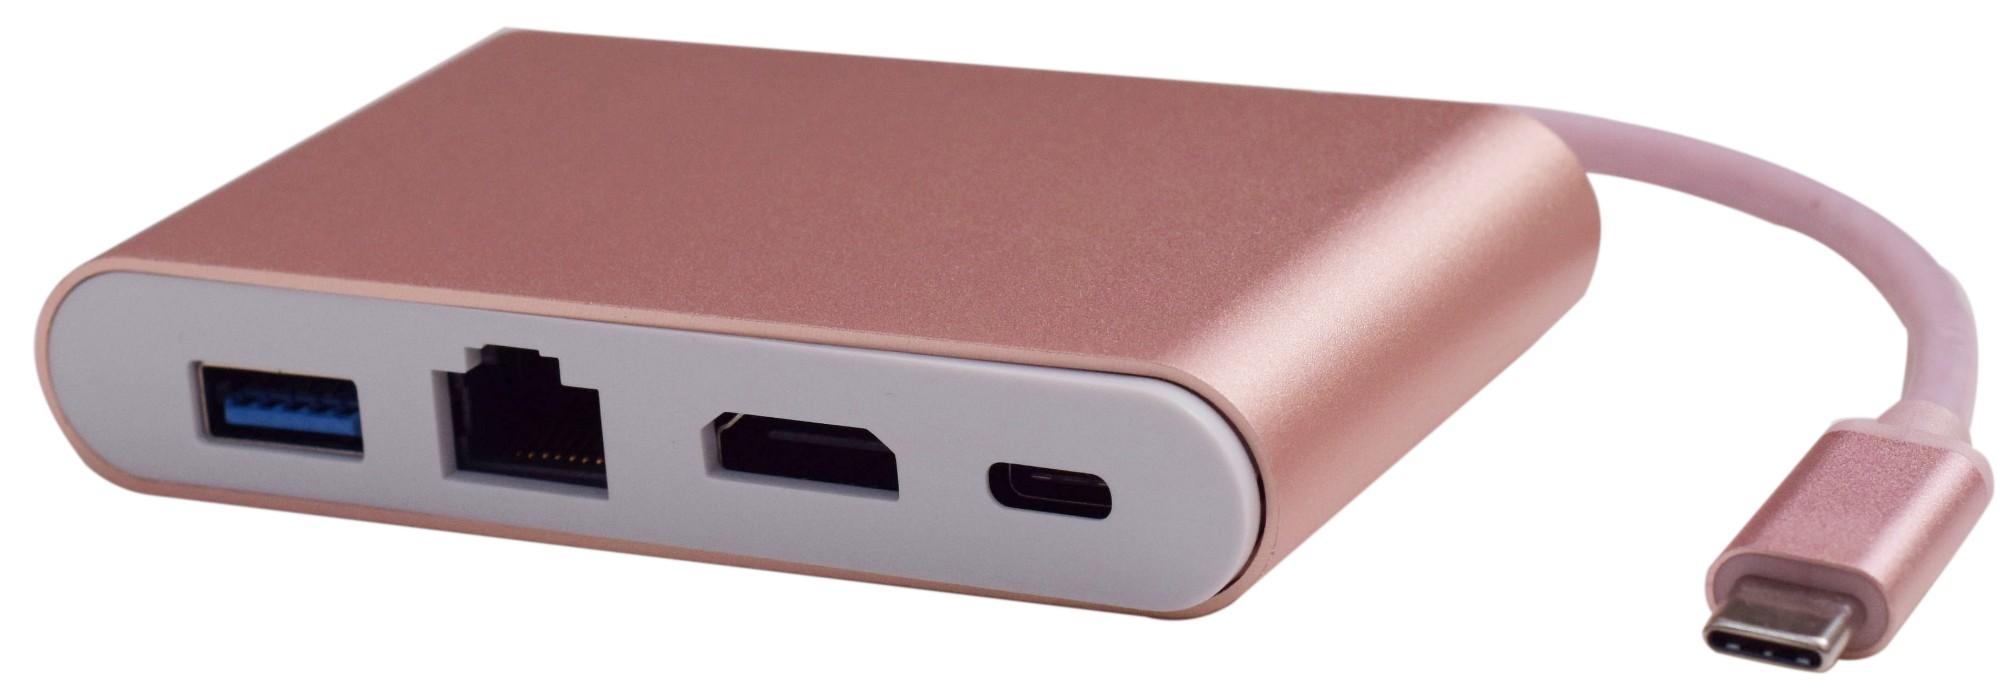 USB 3.1 Type-C To USB 3.0x3 Gigabit Ethernet Type-C PD Charging Adapter